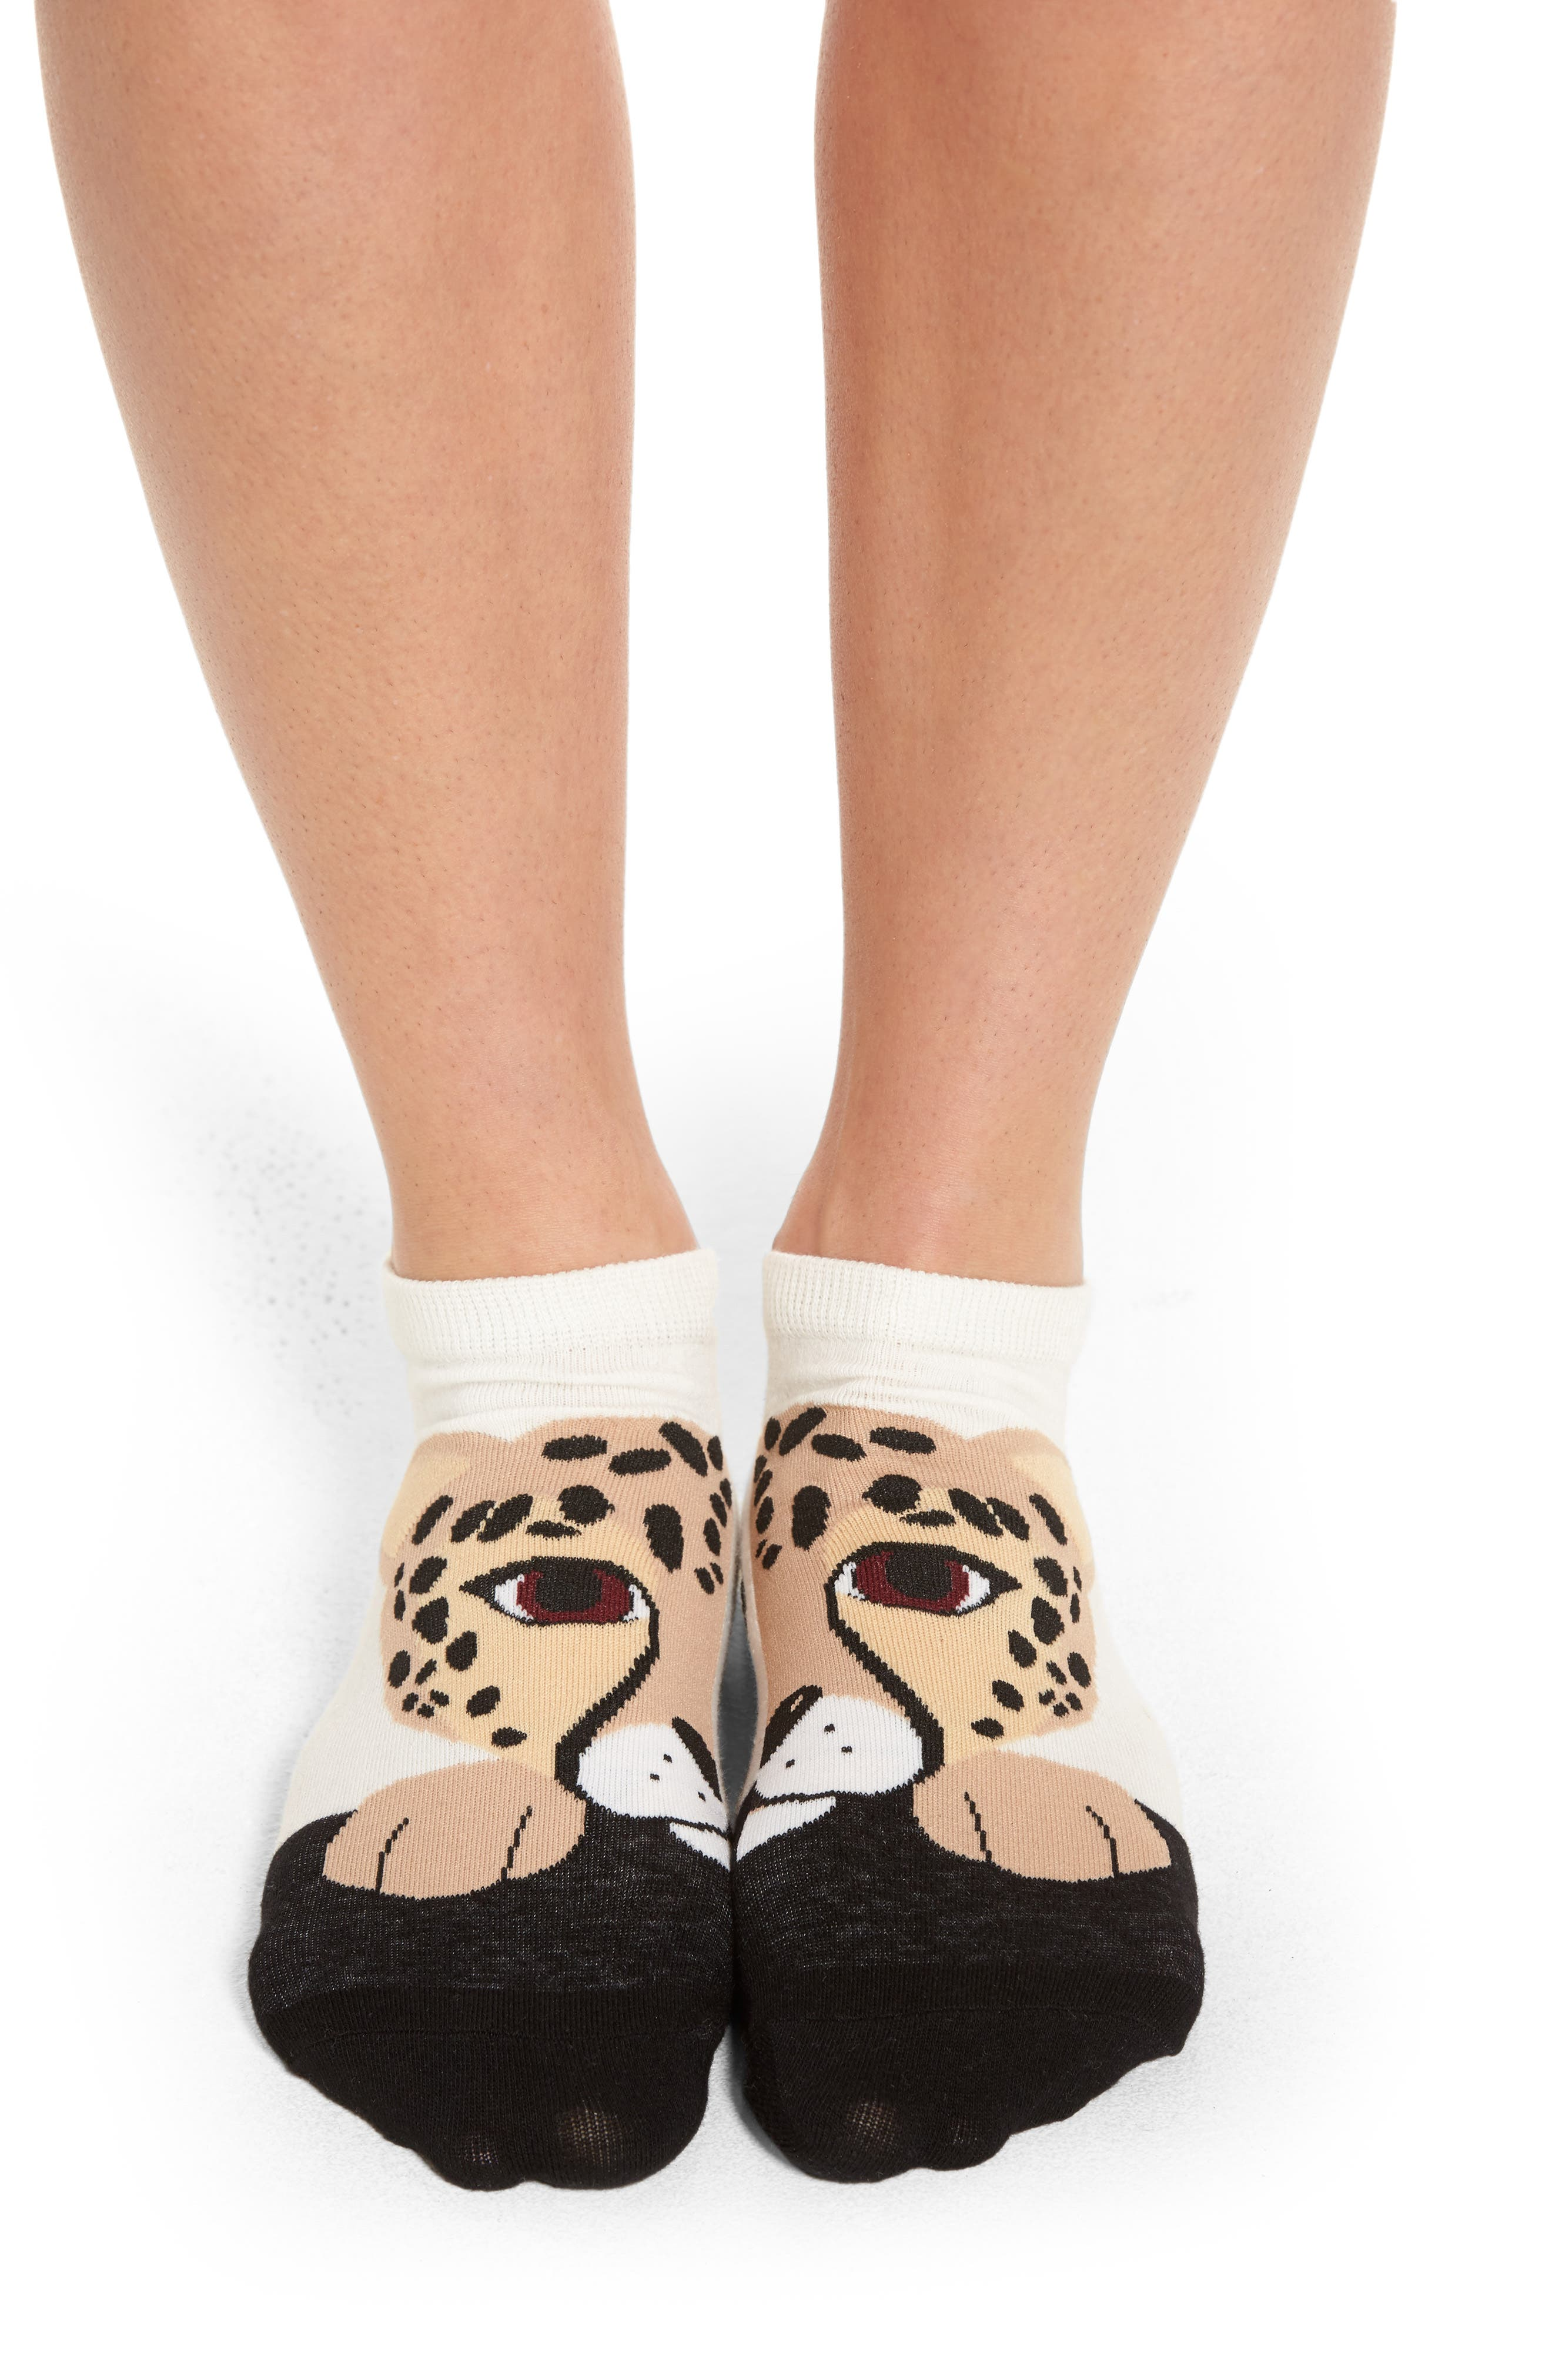 Main Image - kate spade new york cheetah no-show socks (3 for $21.00)